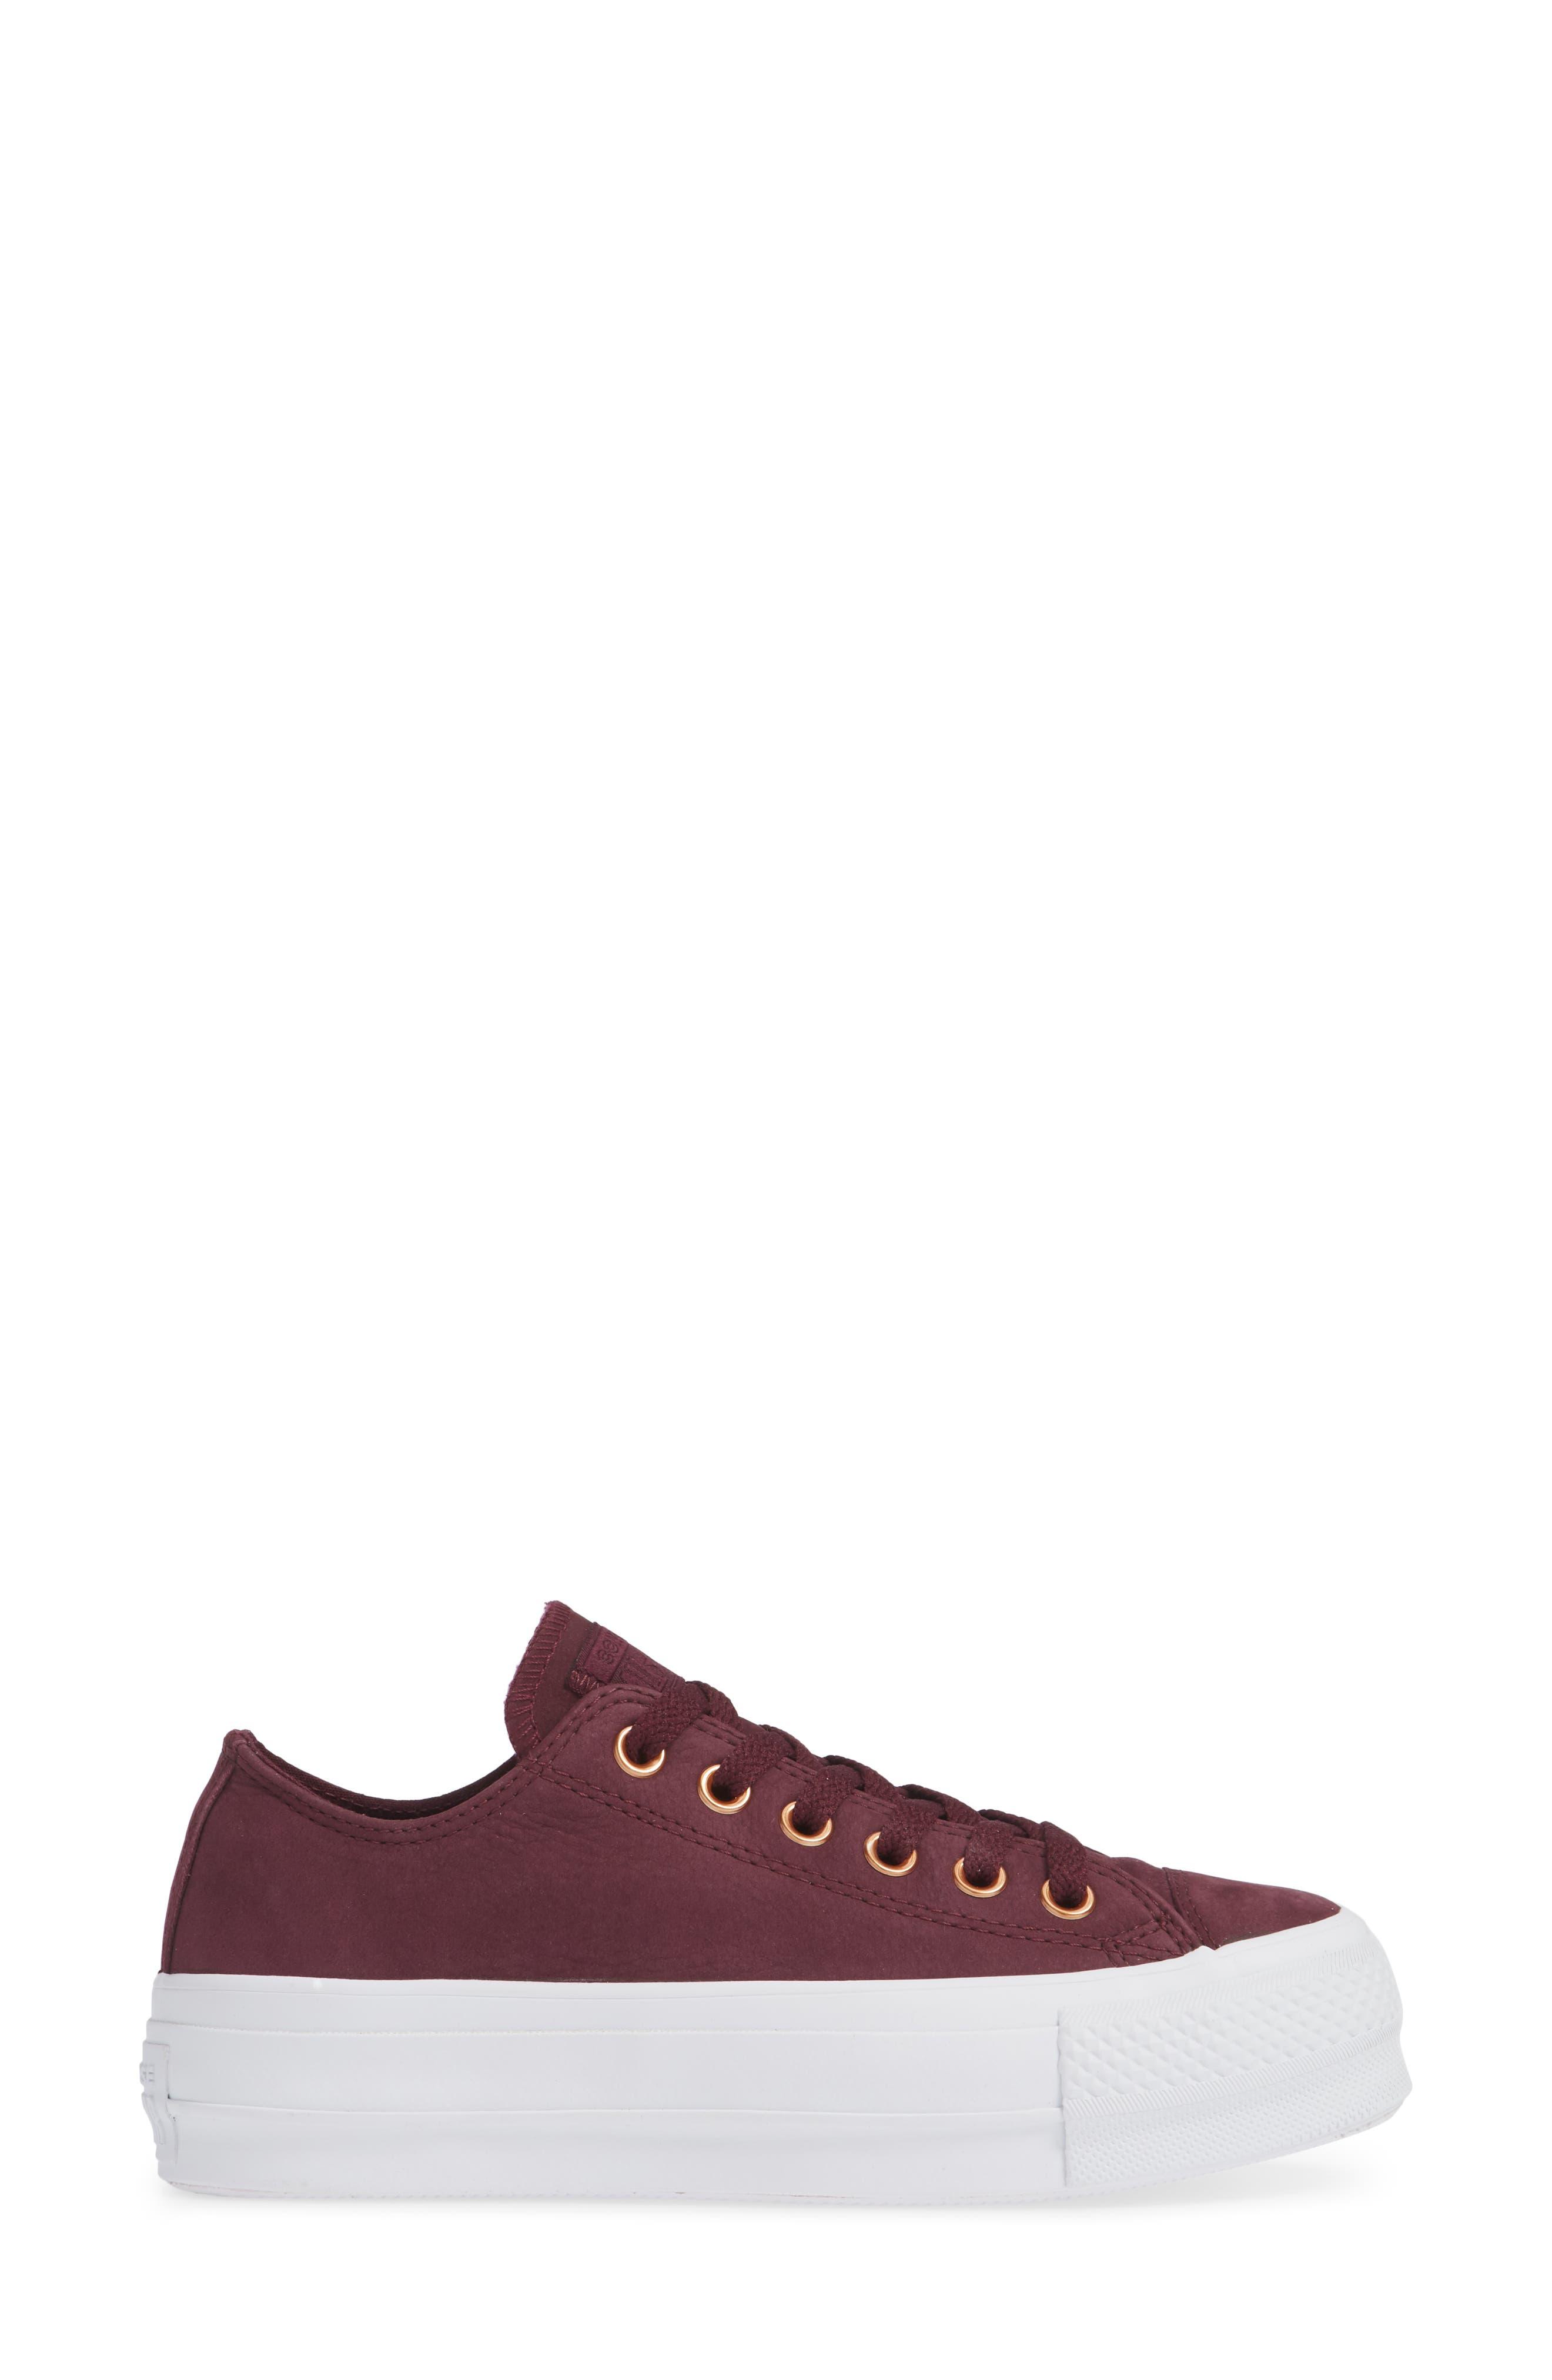 Chuck Taylor<sup>®</sup> All Star<sup>®</sup> Platform Sneaker,                             Alternate thumbnail 3, color,                             Dark Sangria Nubuck